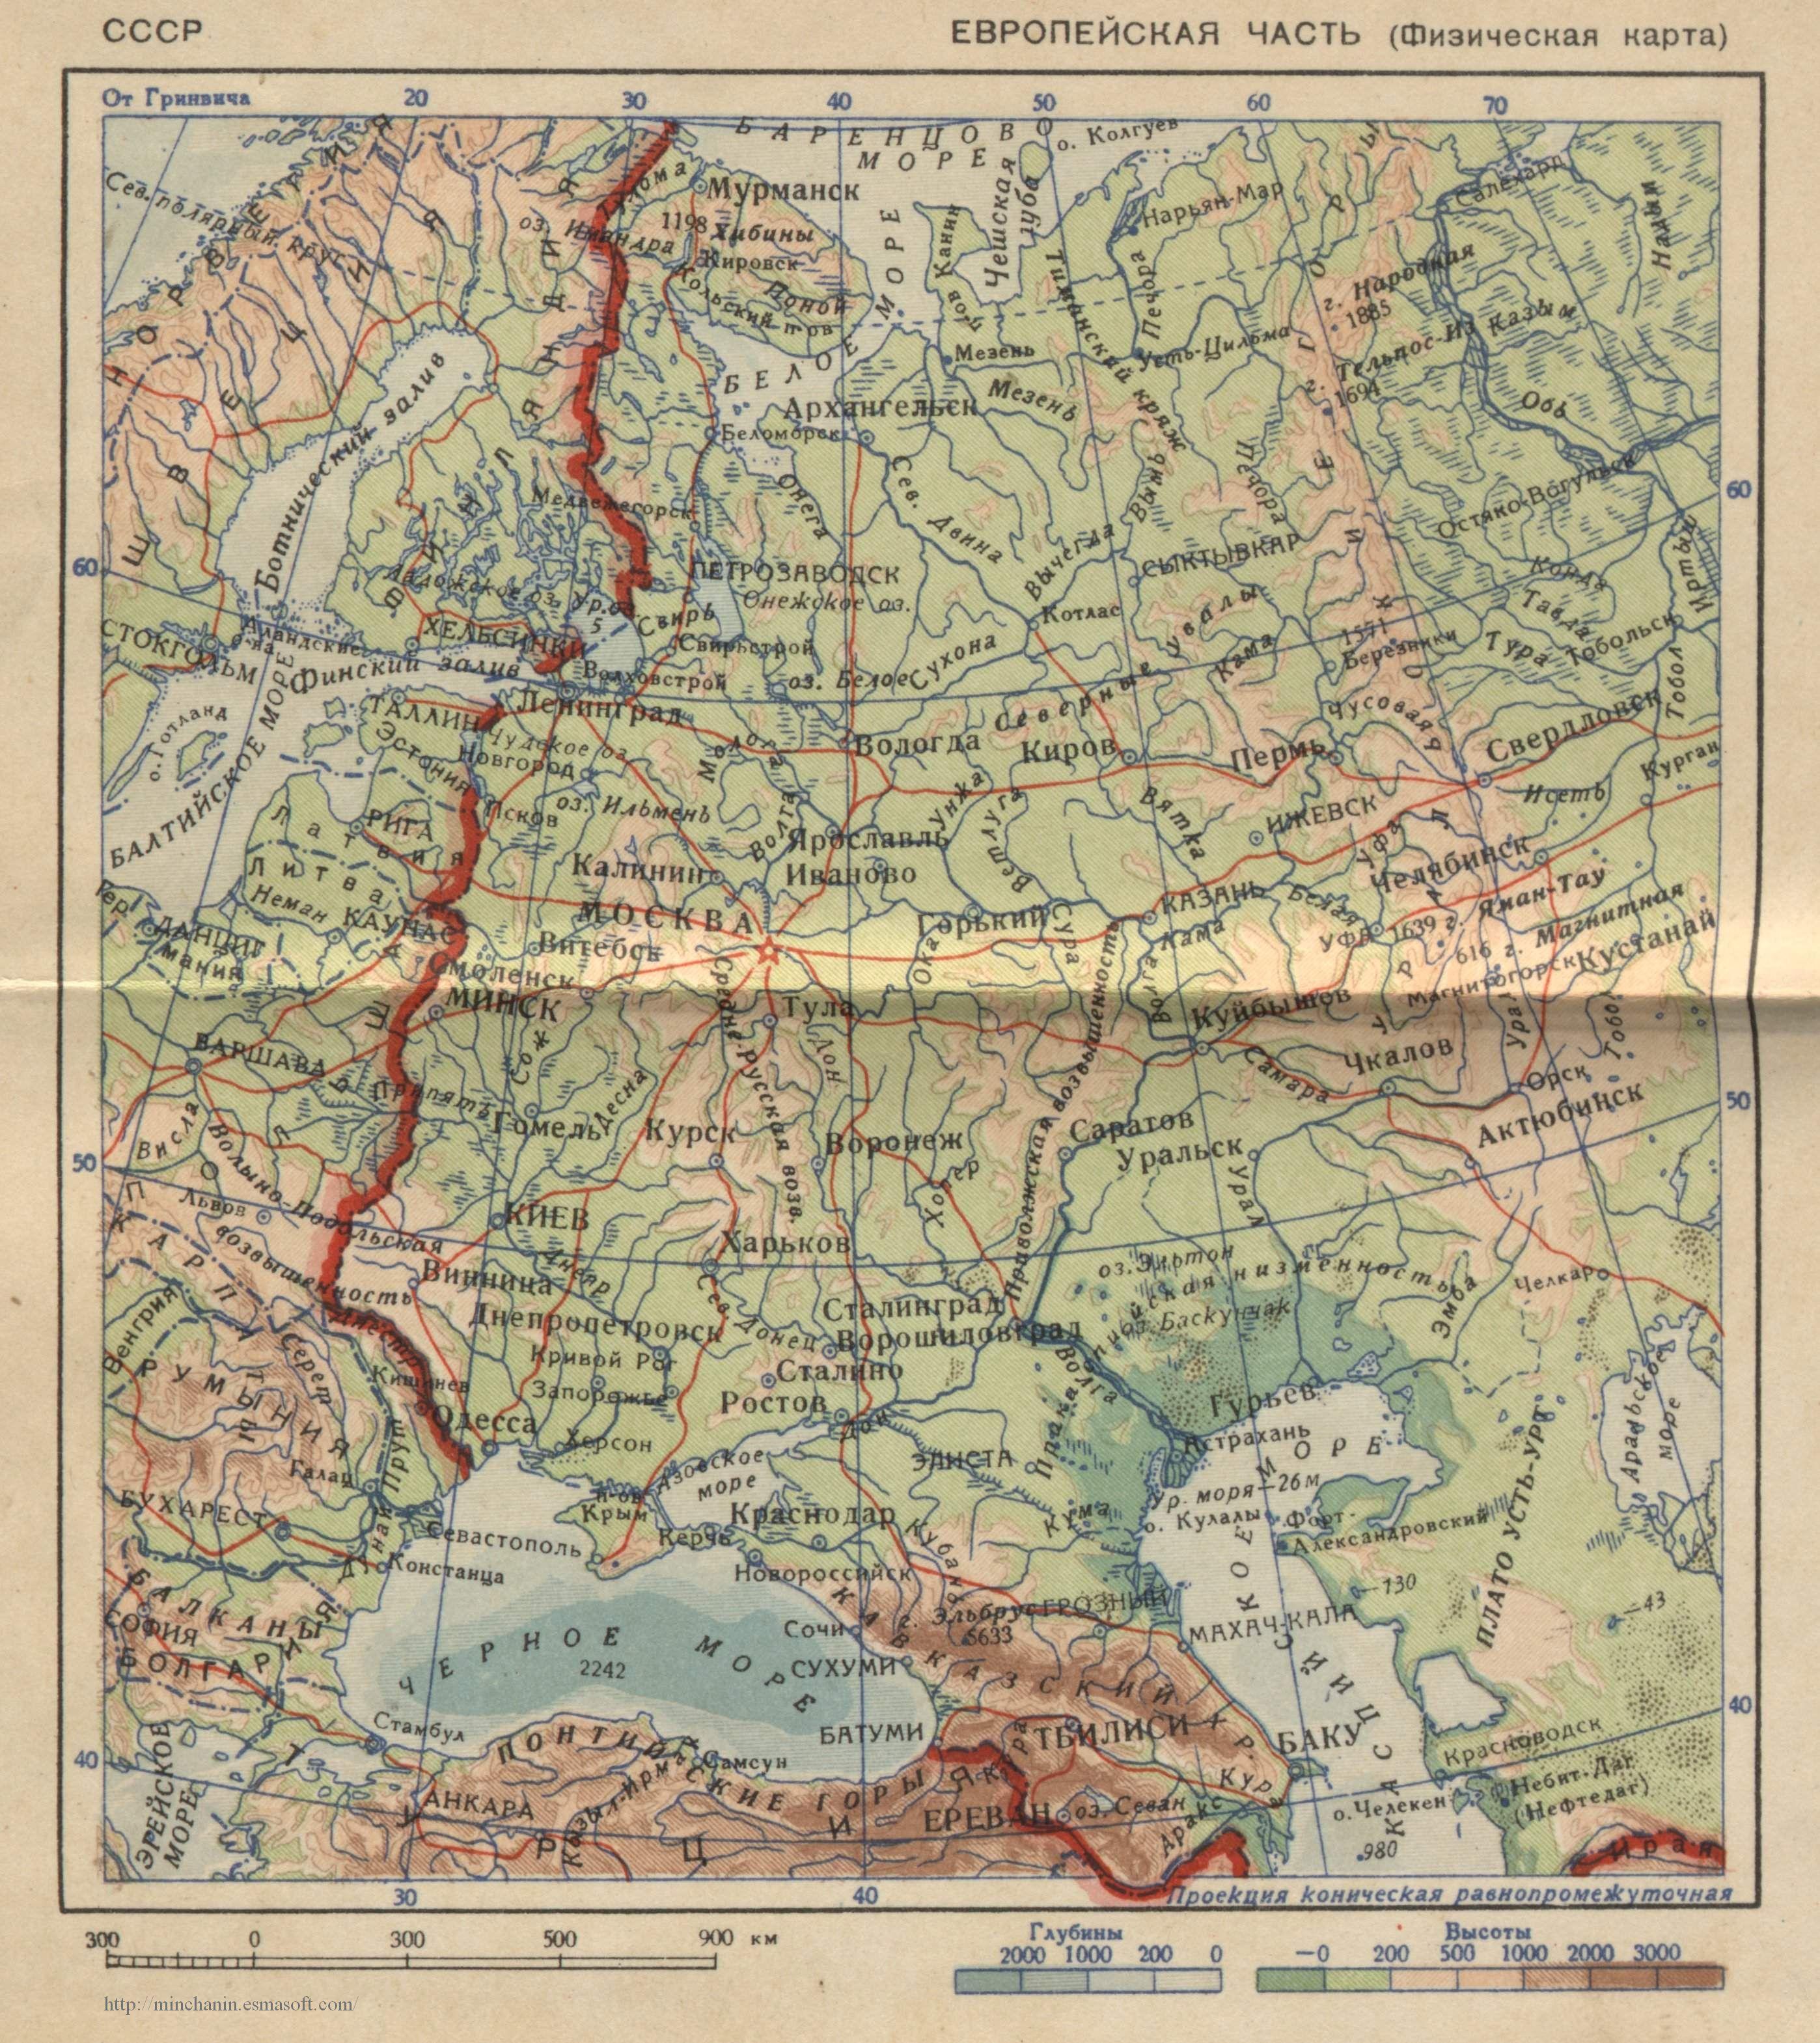 http://minchanin.esmasoft.com/maps/ussr1939/maps/04.jpg